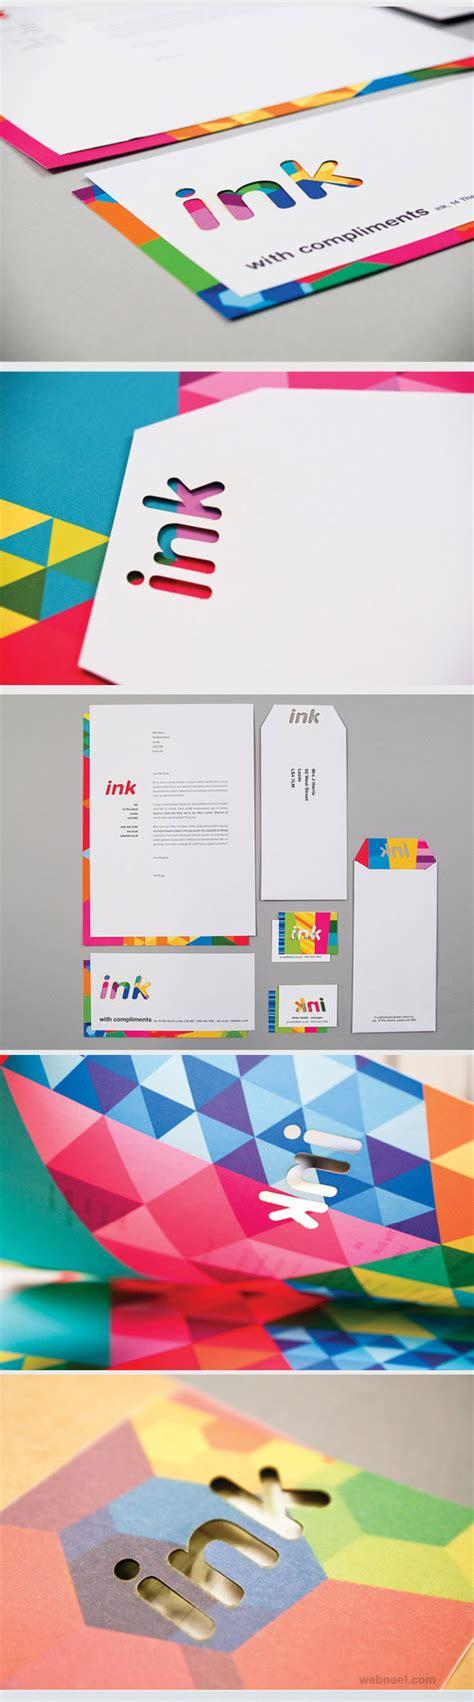 identity design exles creative branding identity design exles for inspiration